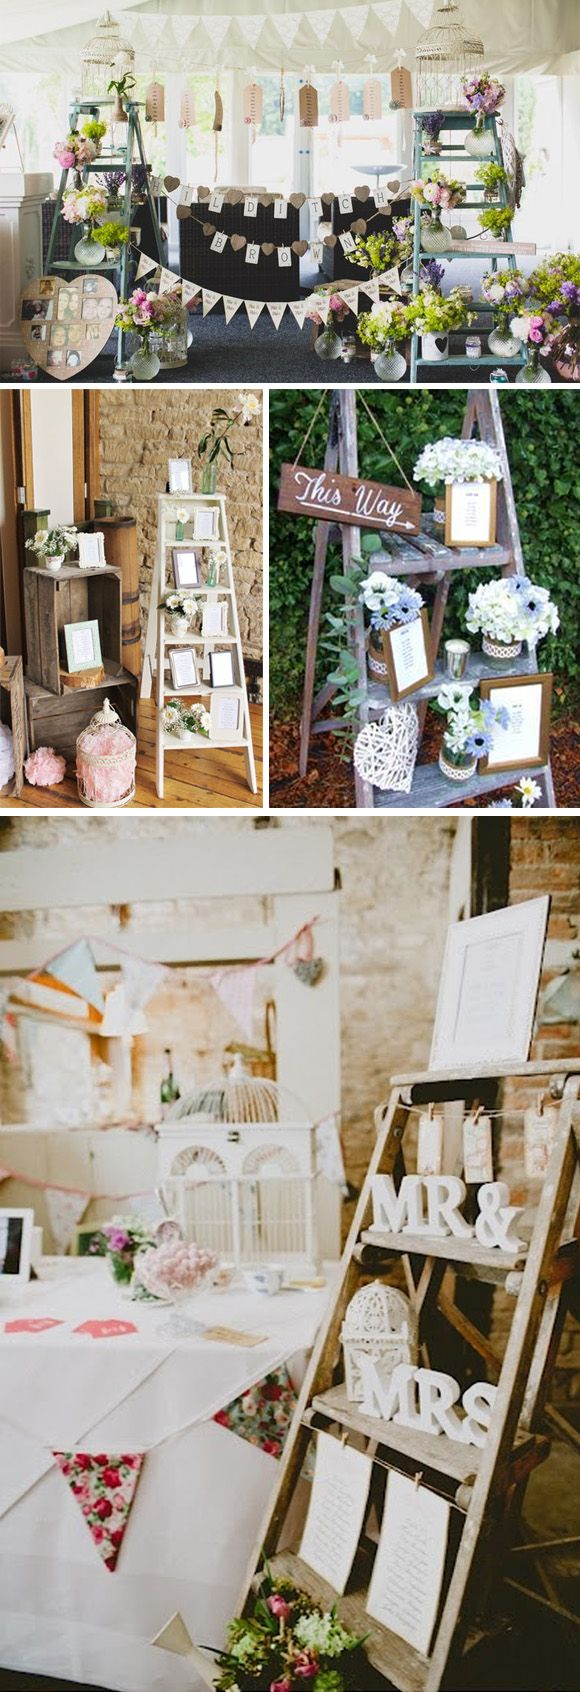 Ideas para decorar bodas con escaleras vintage | Ideas para, Wedding ...